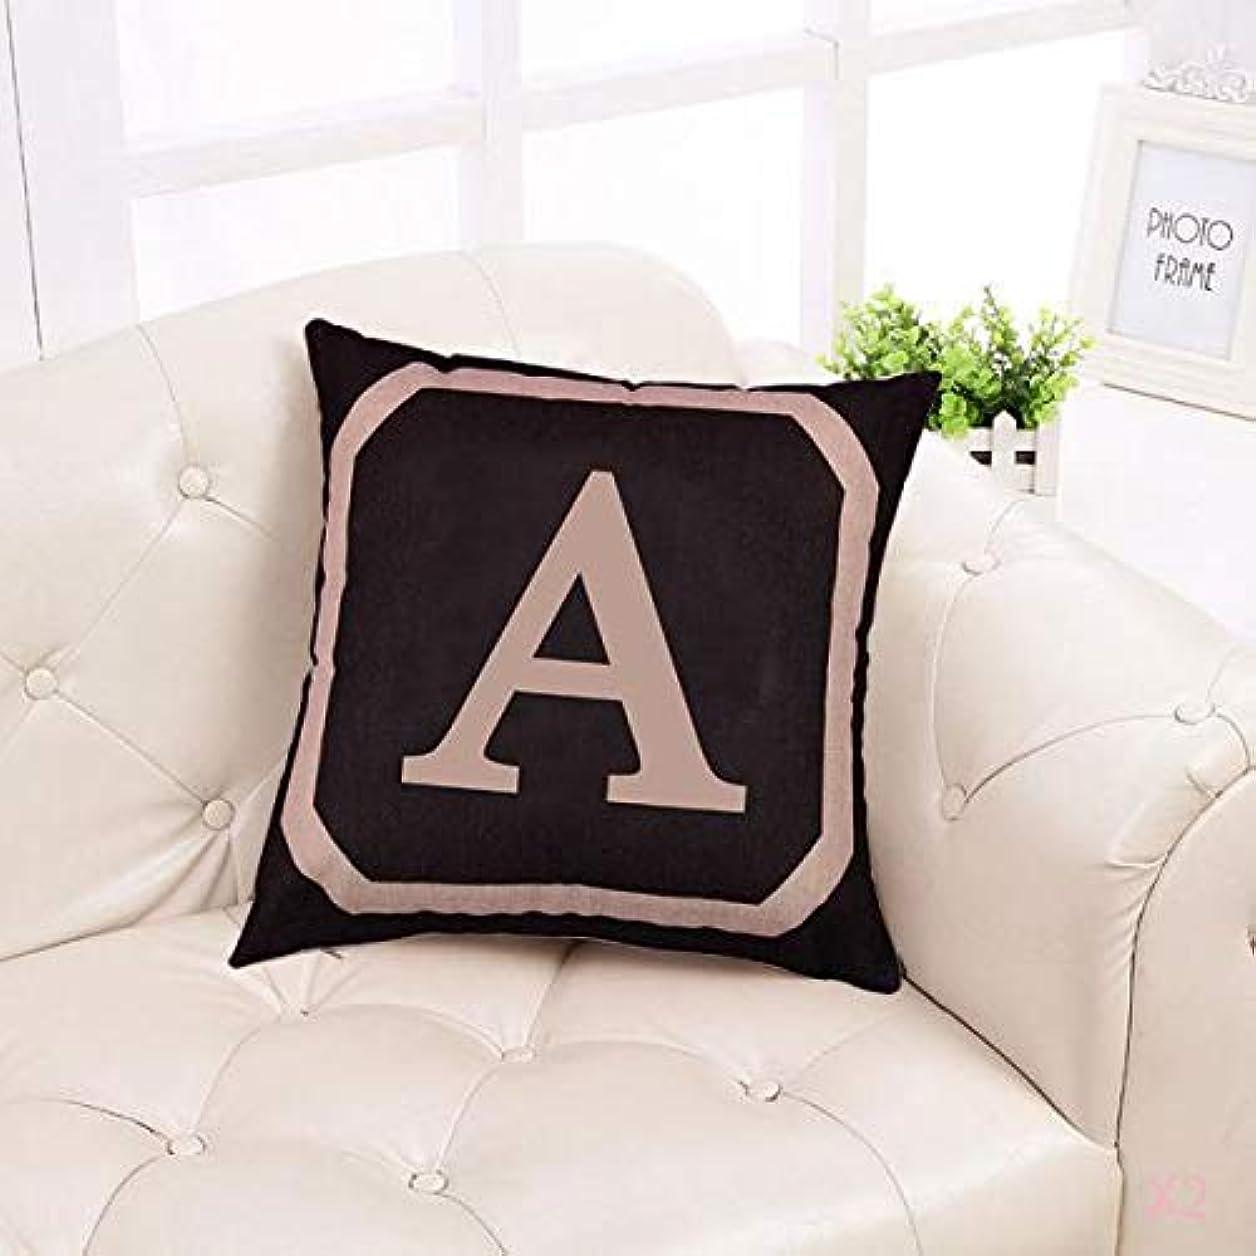 FLAMEER 正方形の綿のリネンスローピローケース腰クッションカバーベッドソファ装飾A